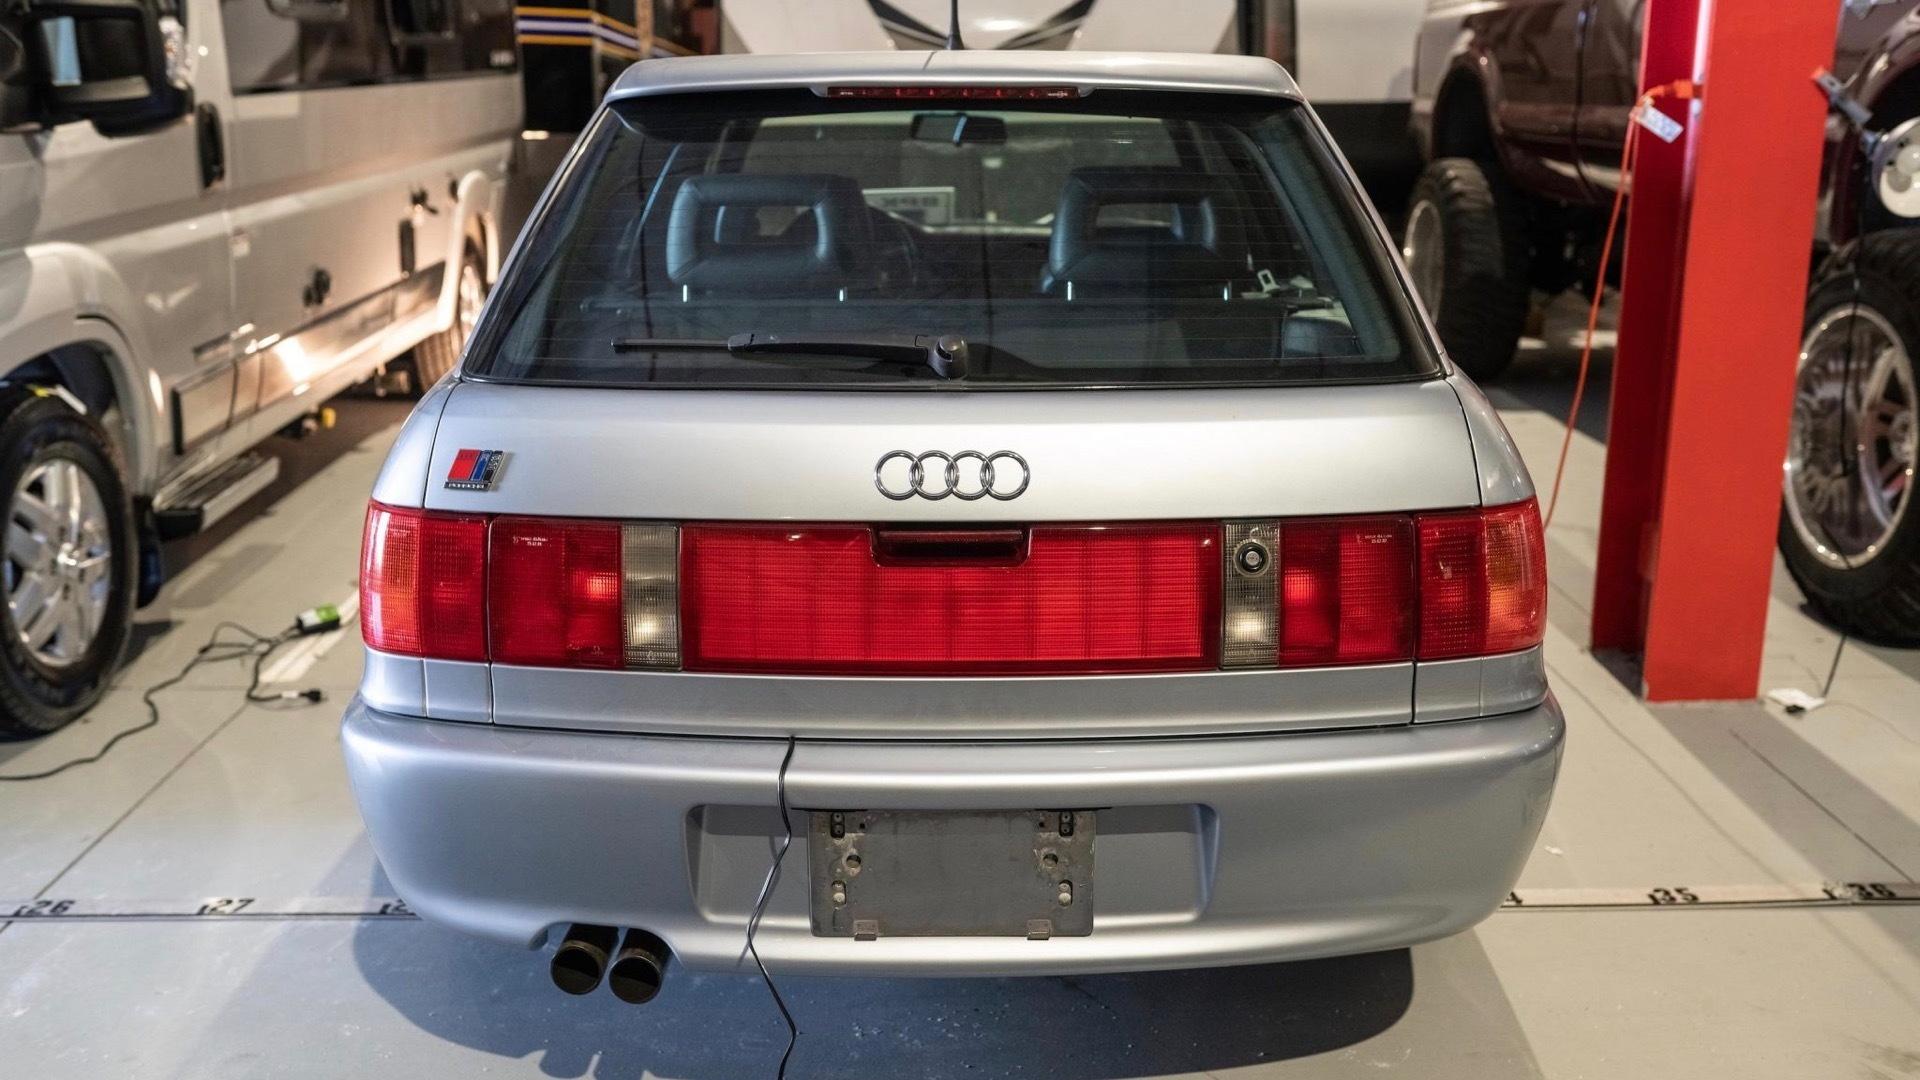 1994 Audi RS 2 Avant (photo via Bring a Trailer)